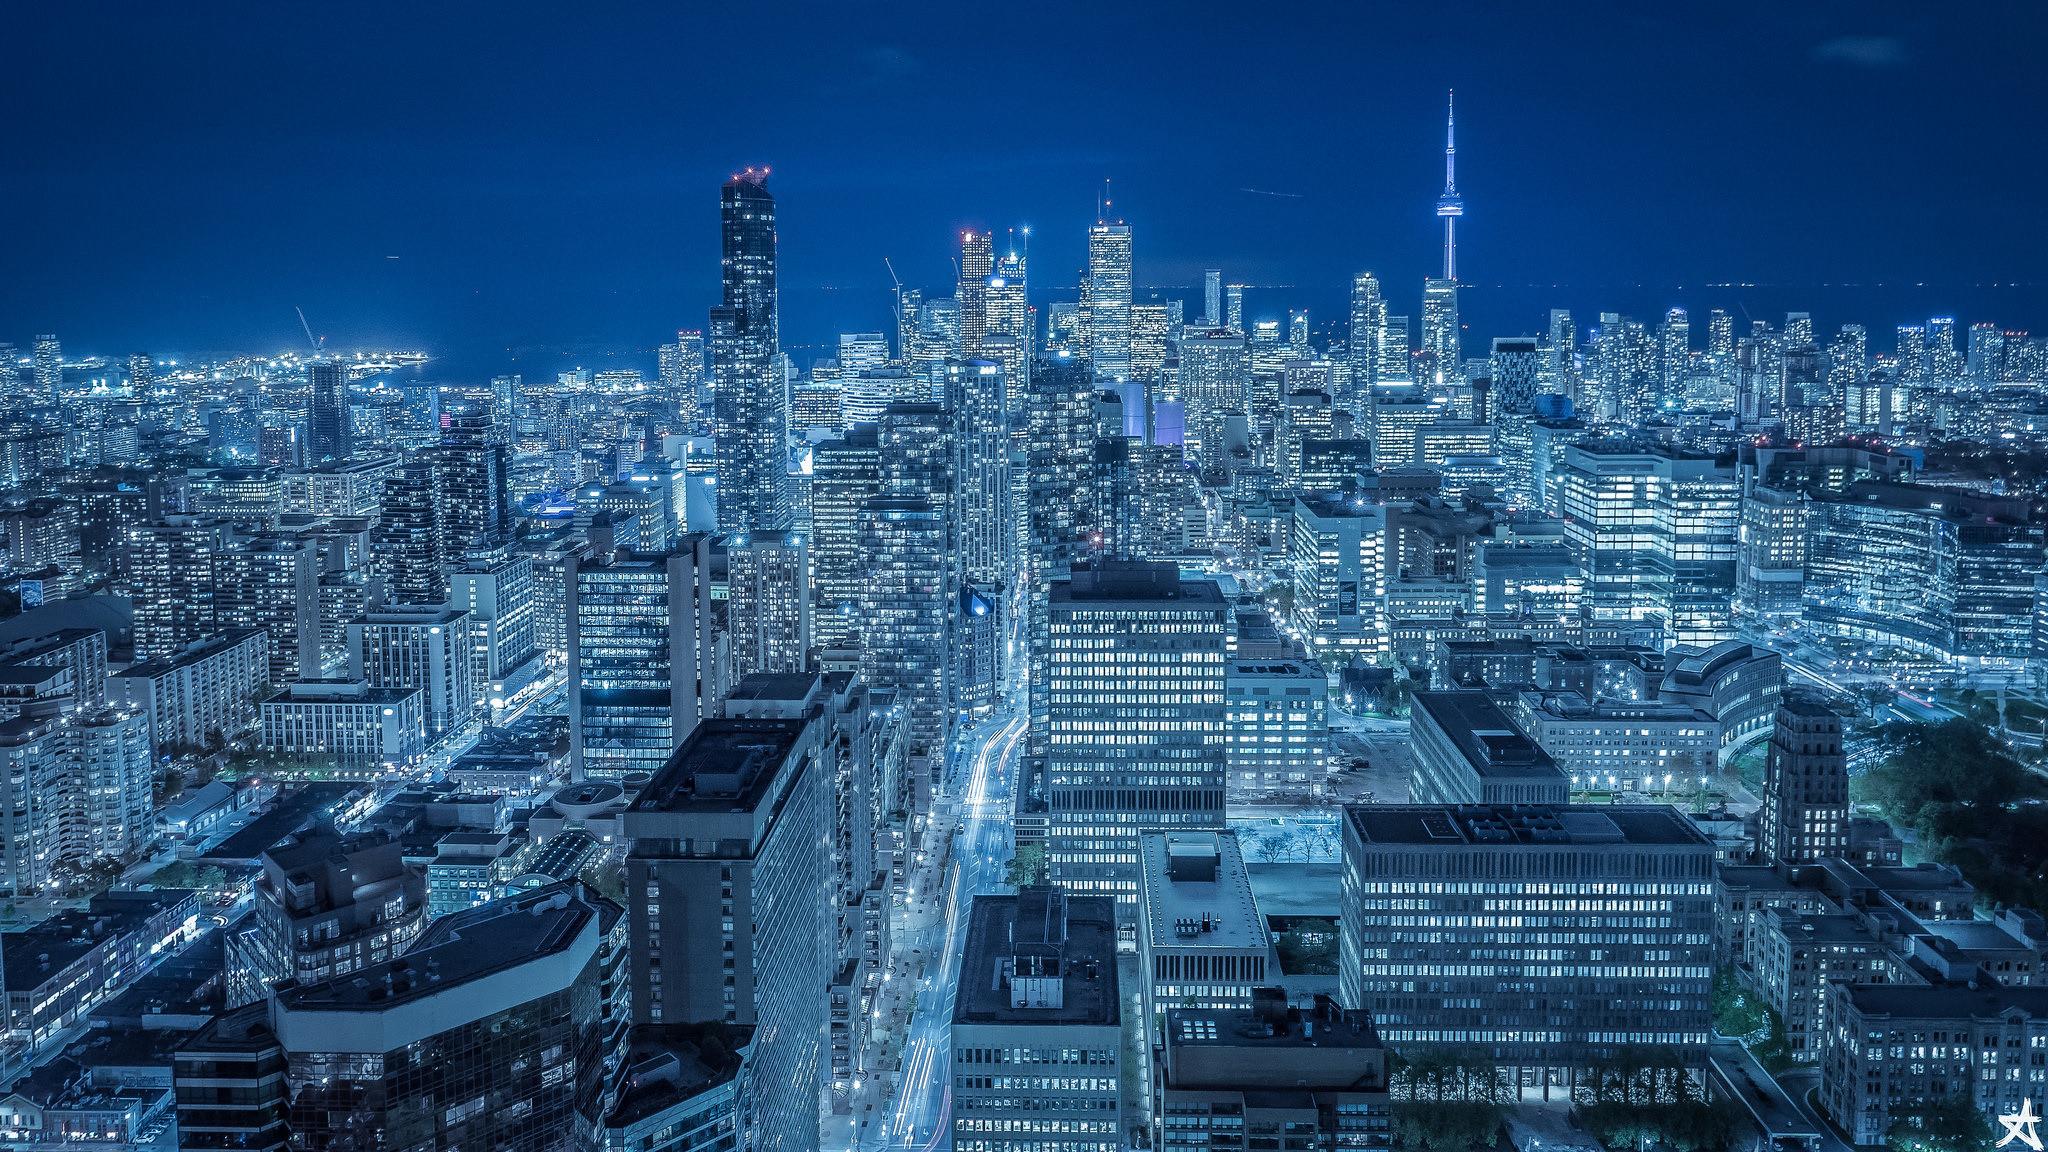 Man Made – Toronto Skyscraper City Night Canada Wallpaper